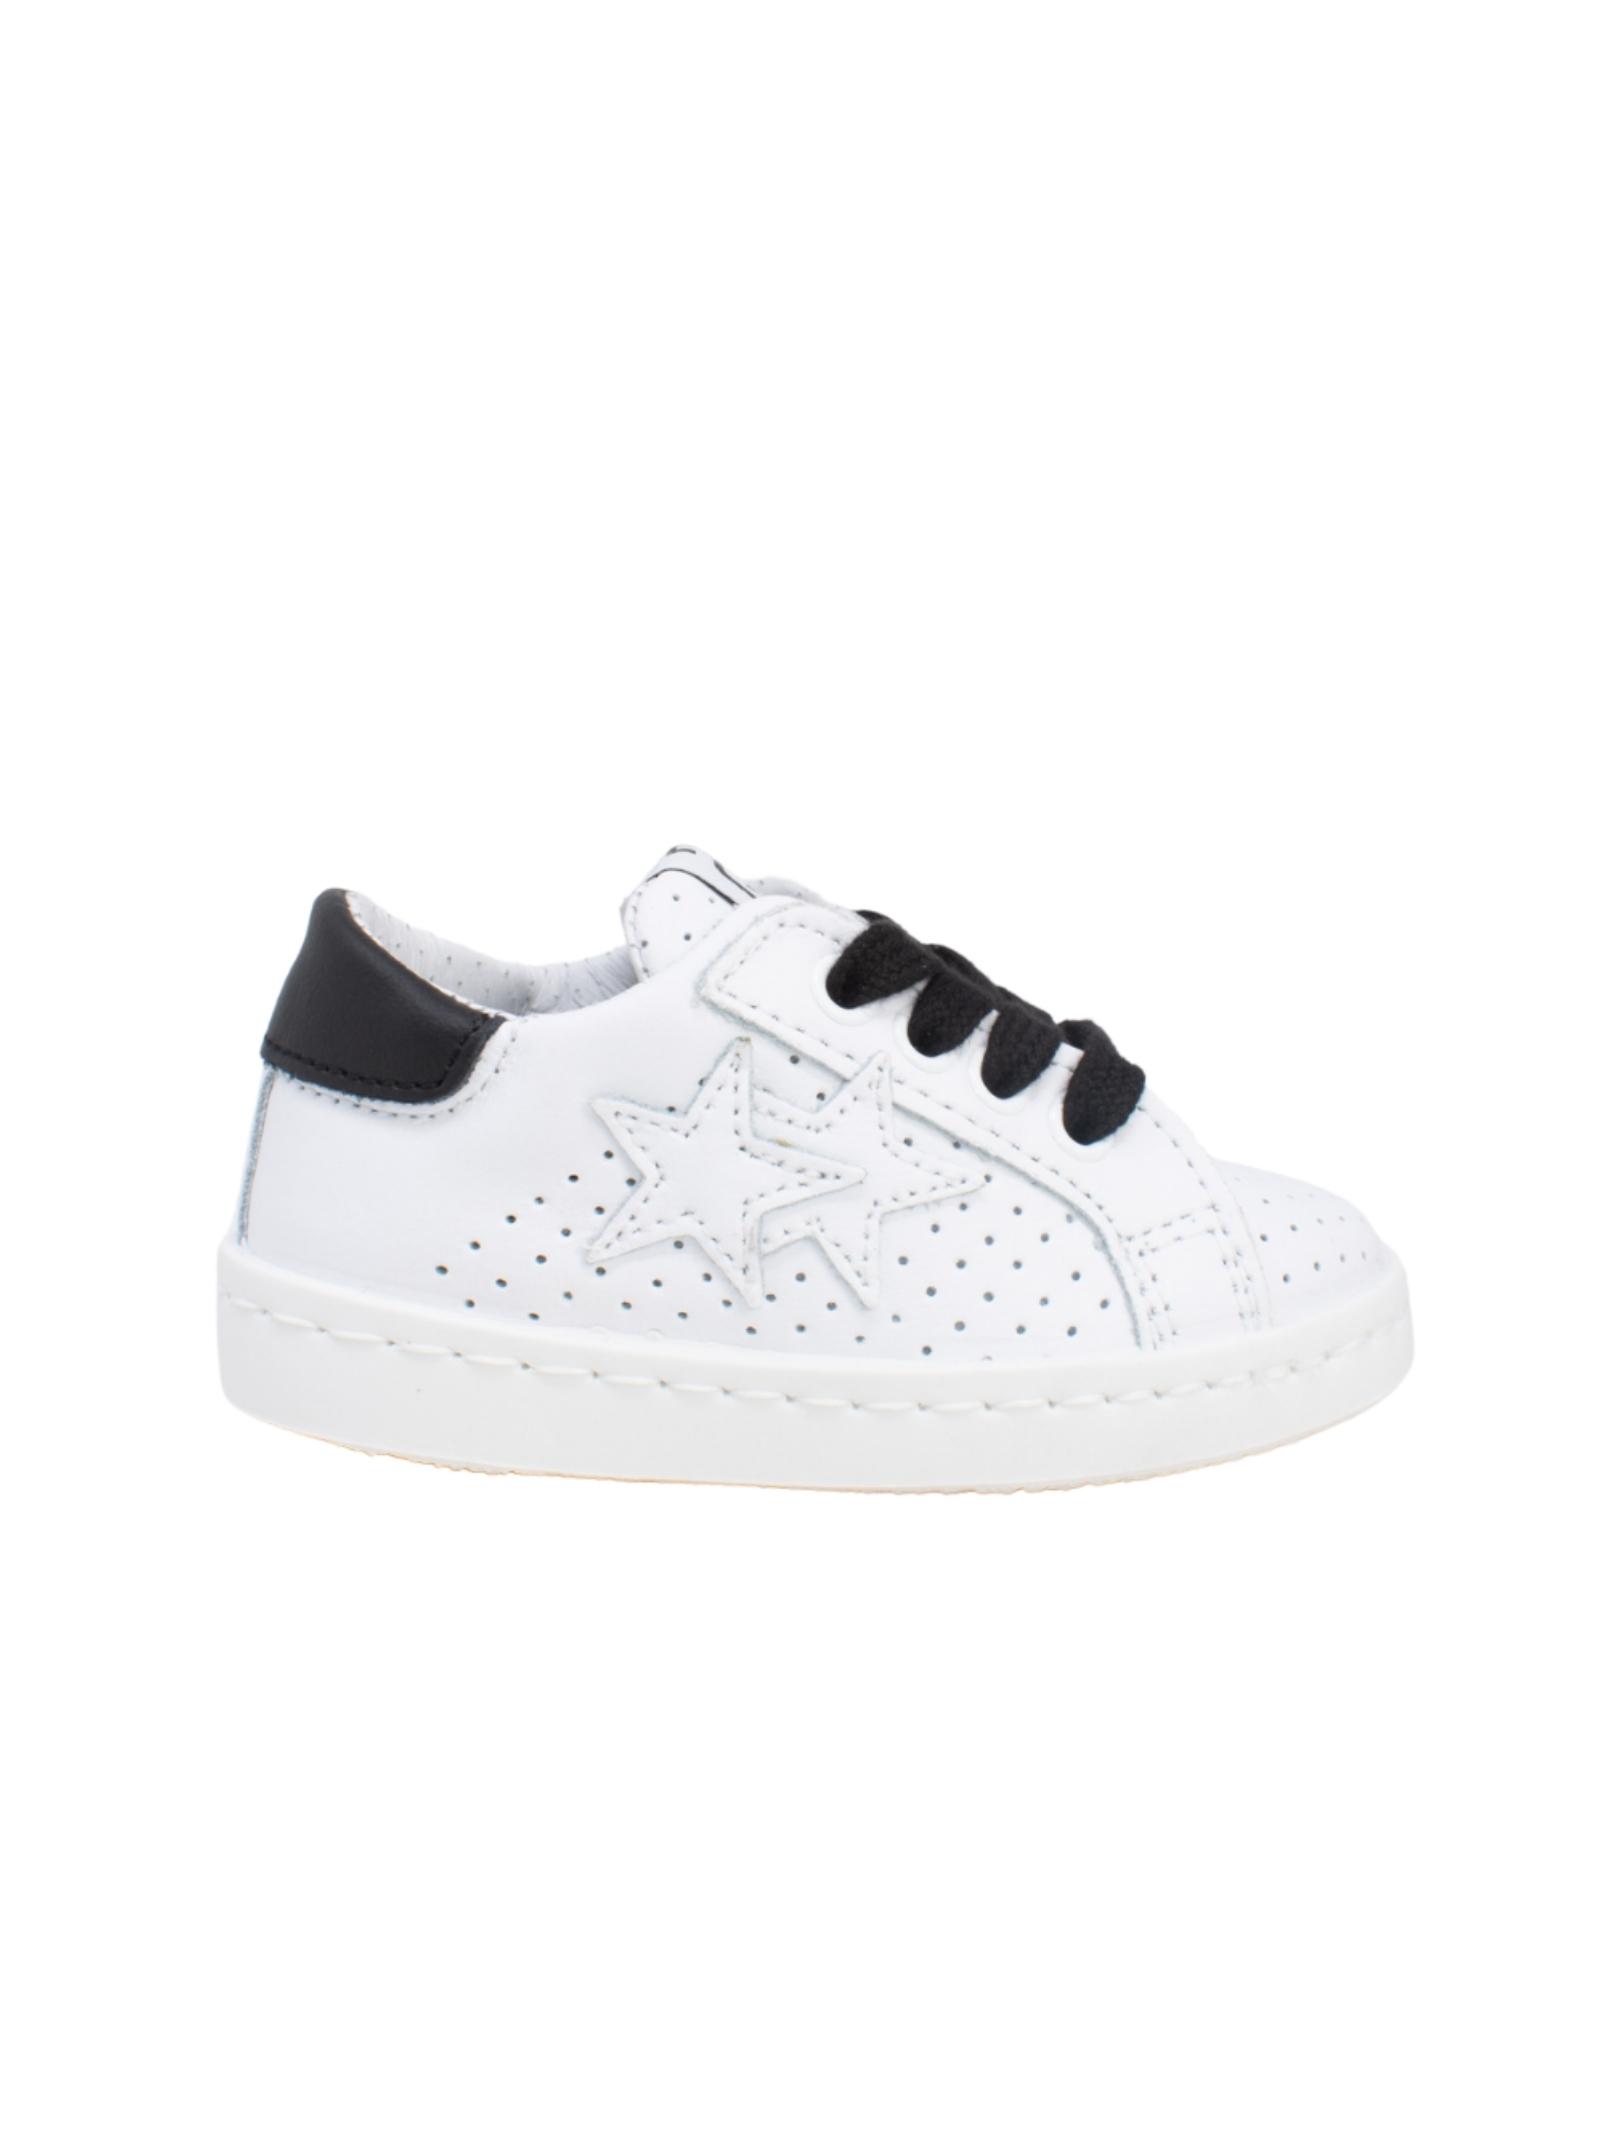 Sneakers Bambino Low 2STAR KIDS | Sneakers | 2SB2005001